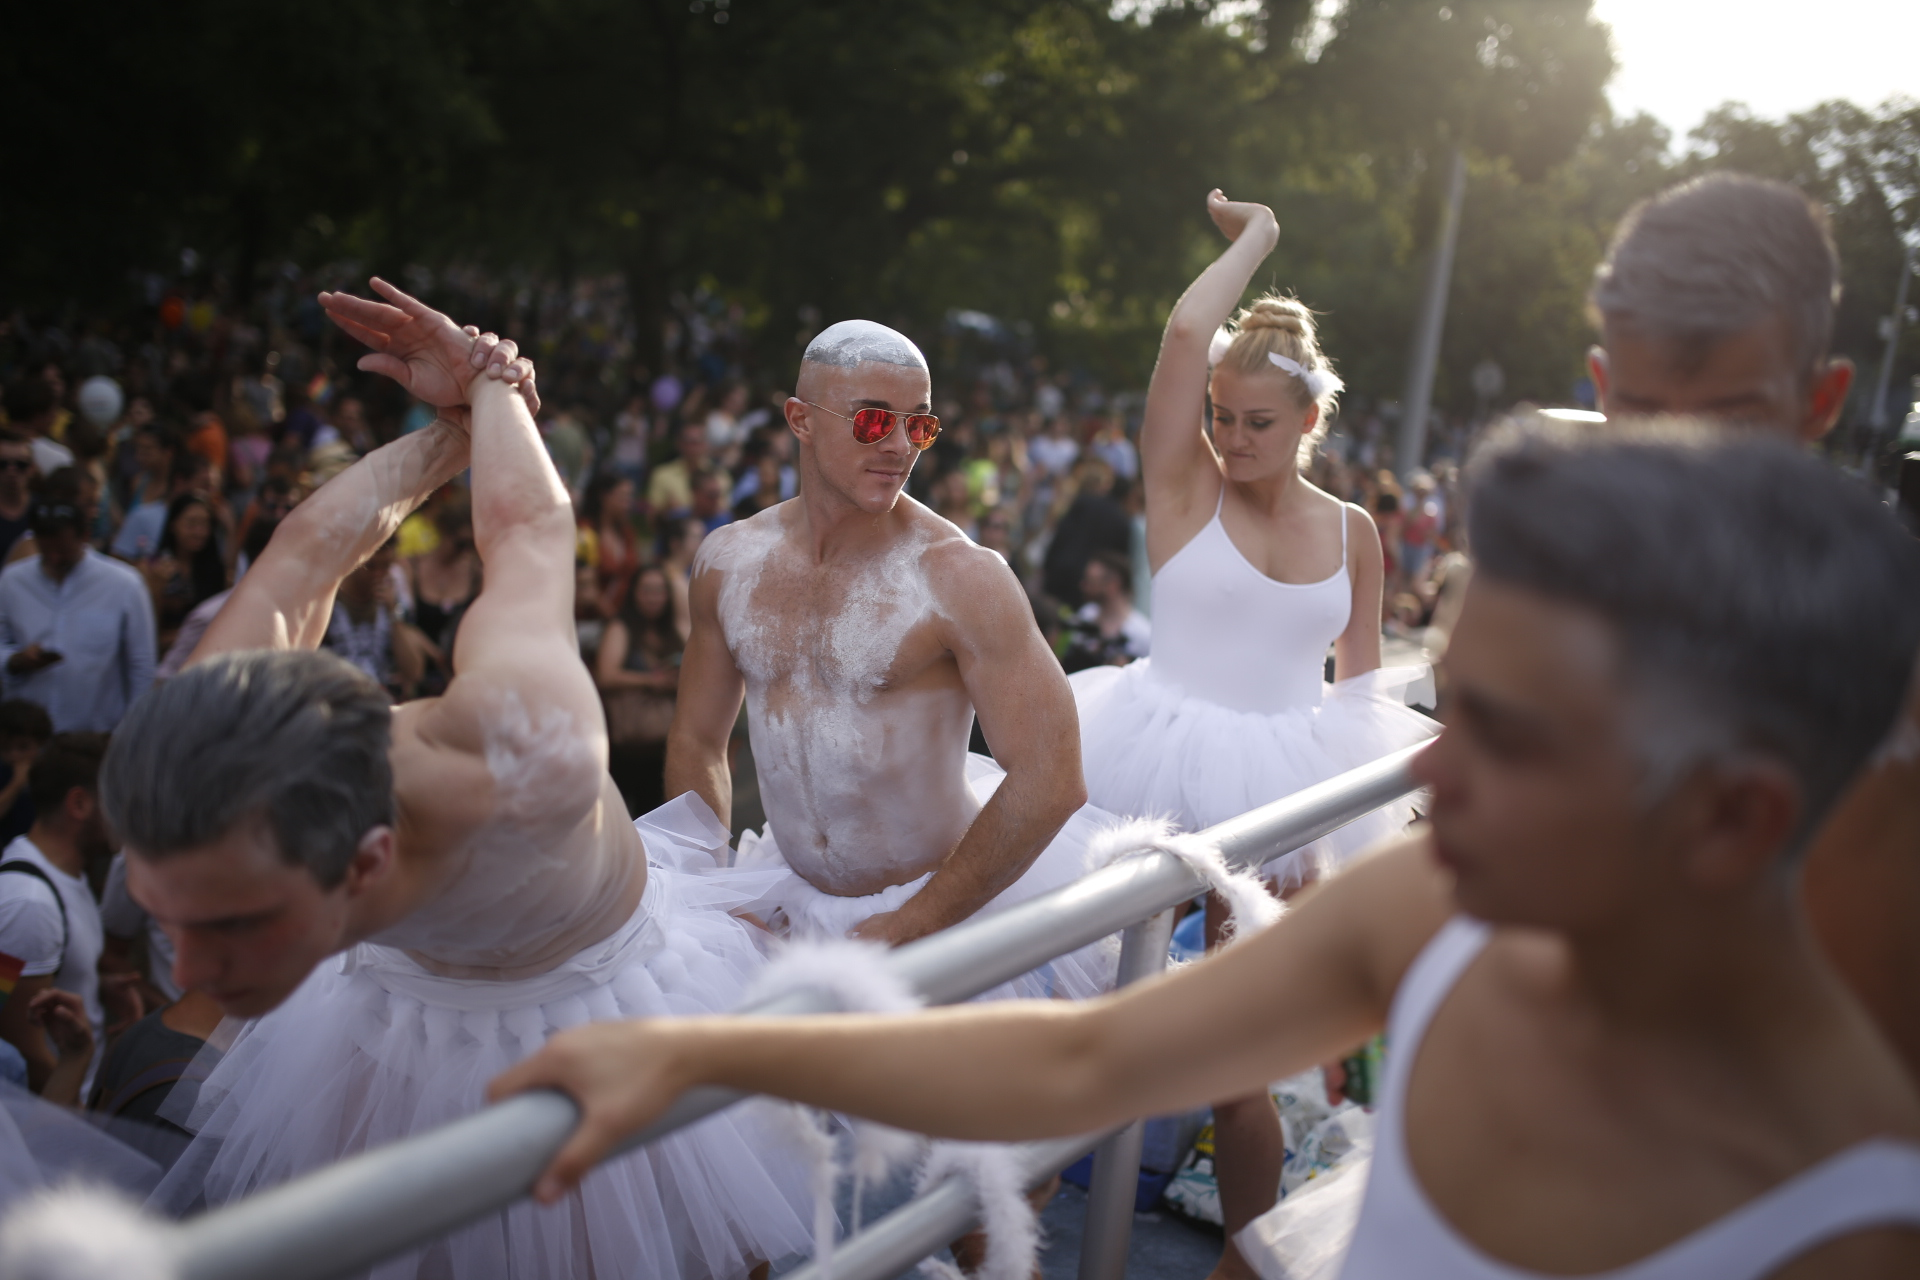 http://img.444.hu/sites/25/budapest-pride-fot%C3%B3k-21.jpg